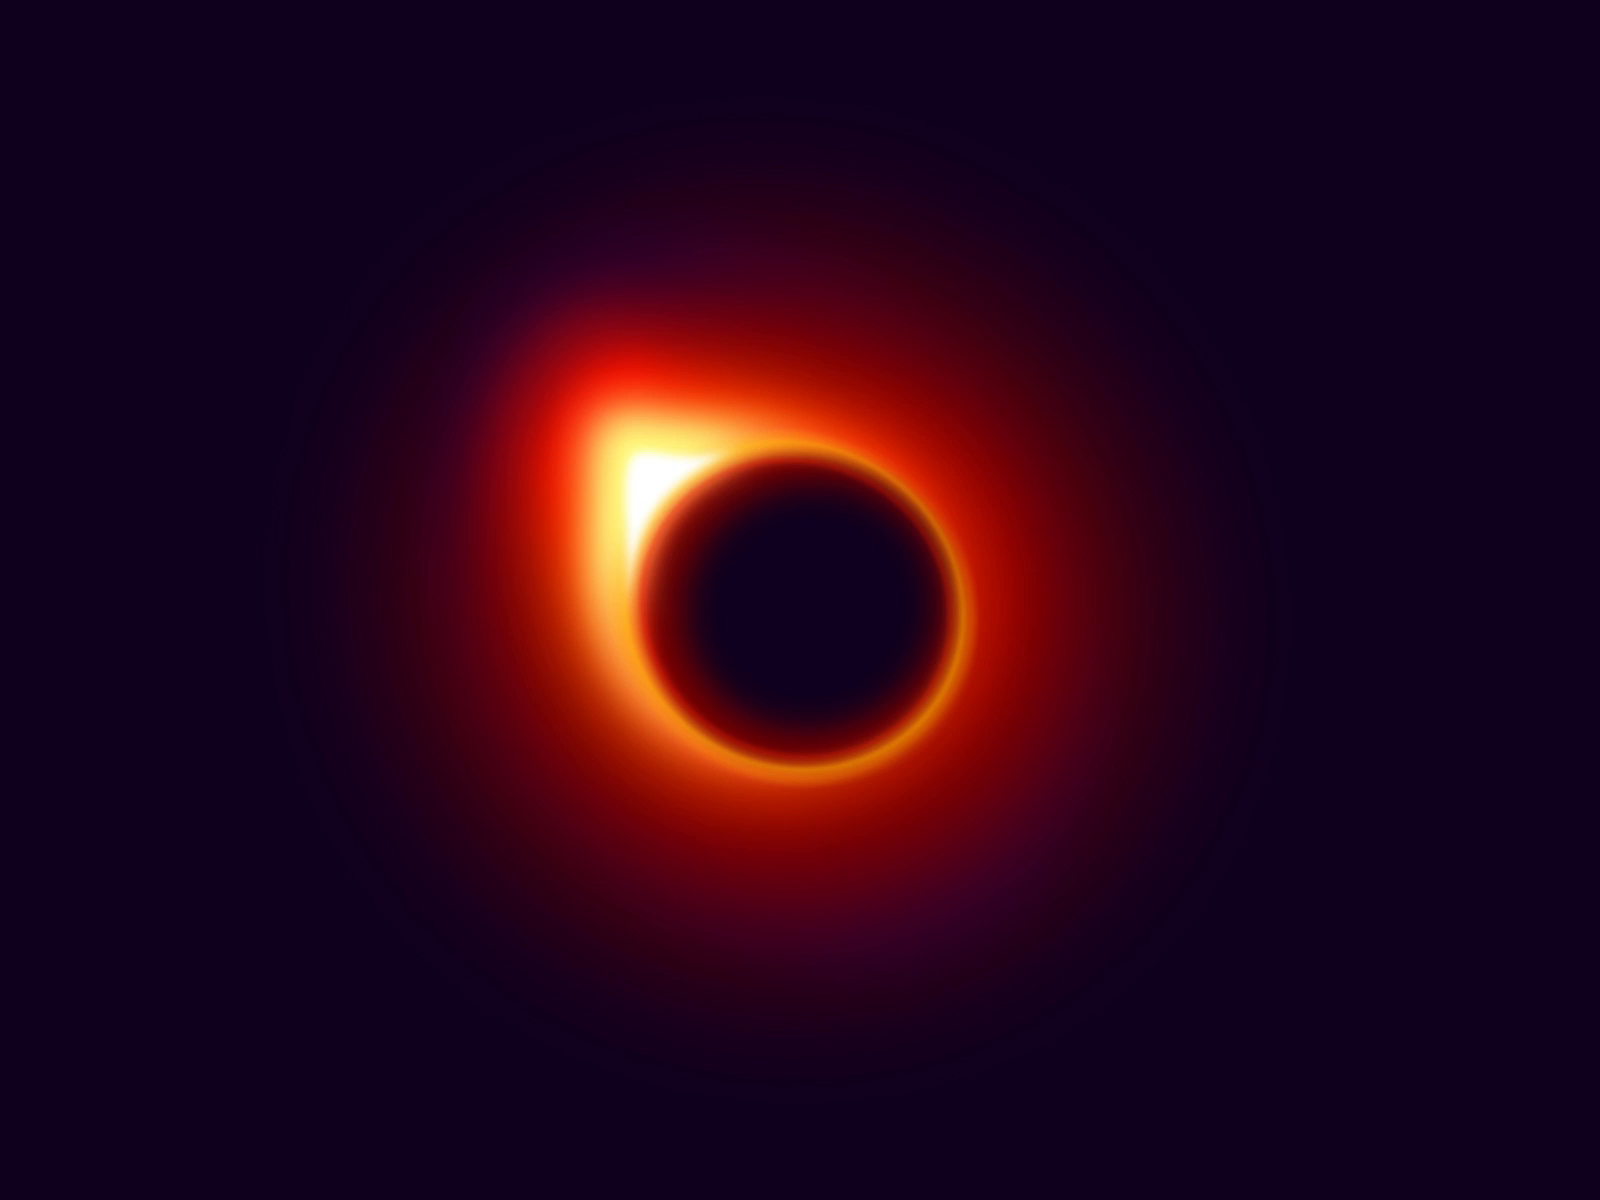 supermassive black hole video - HD1600×1200